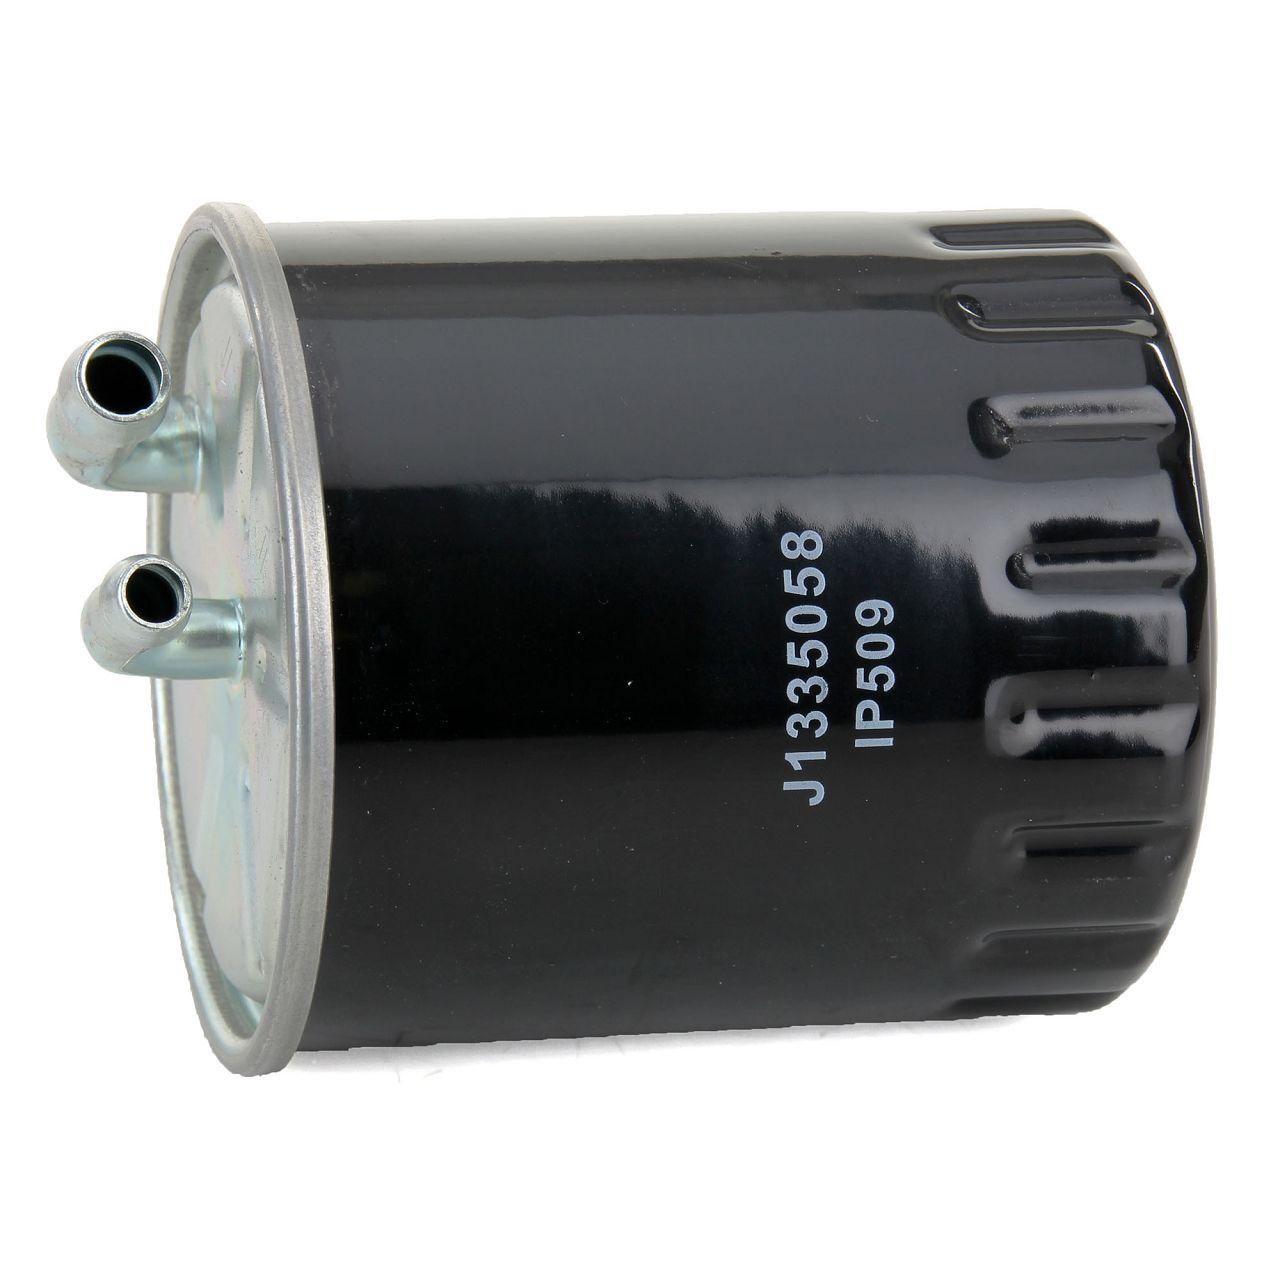 HERTH+BUSS JAKOPARTS Filterset für MITSUBISHI COLT VI 1.5DI-D 68/95PS